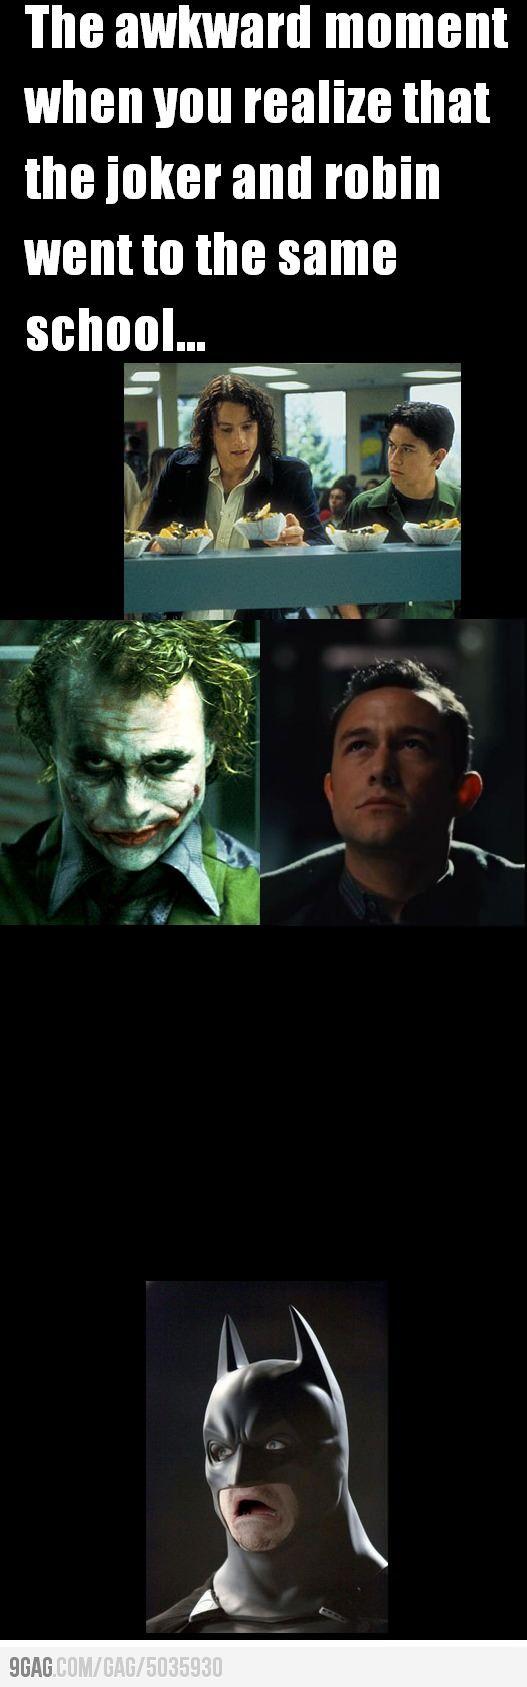 That awkward moment...Robin, Awkward Moments, Batman Face, The Jokers, The Face, Funny, 10 Things, Dark Knight, Heath Ledger